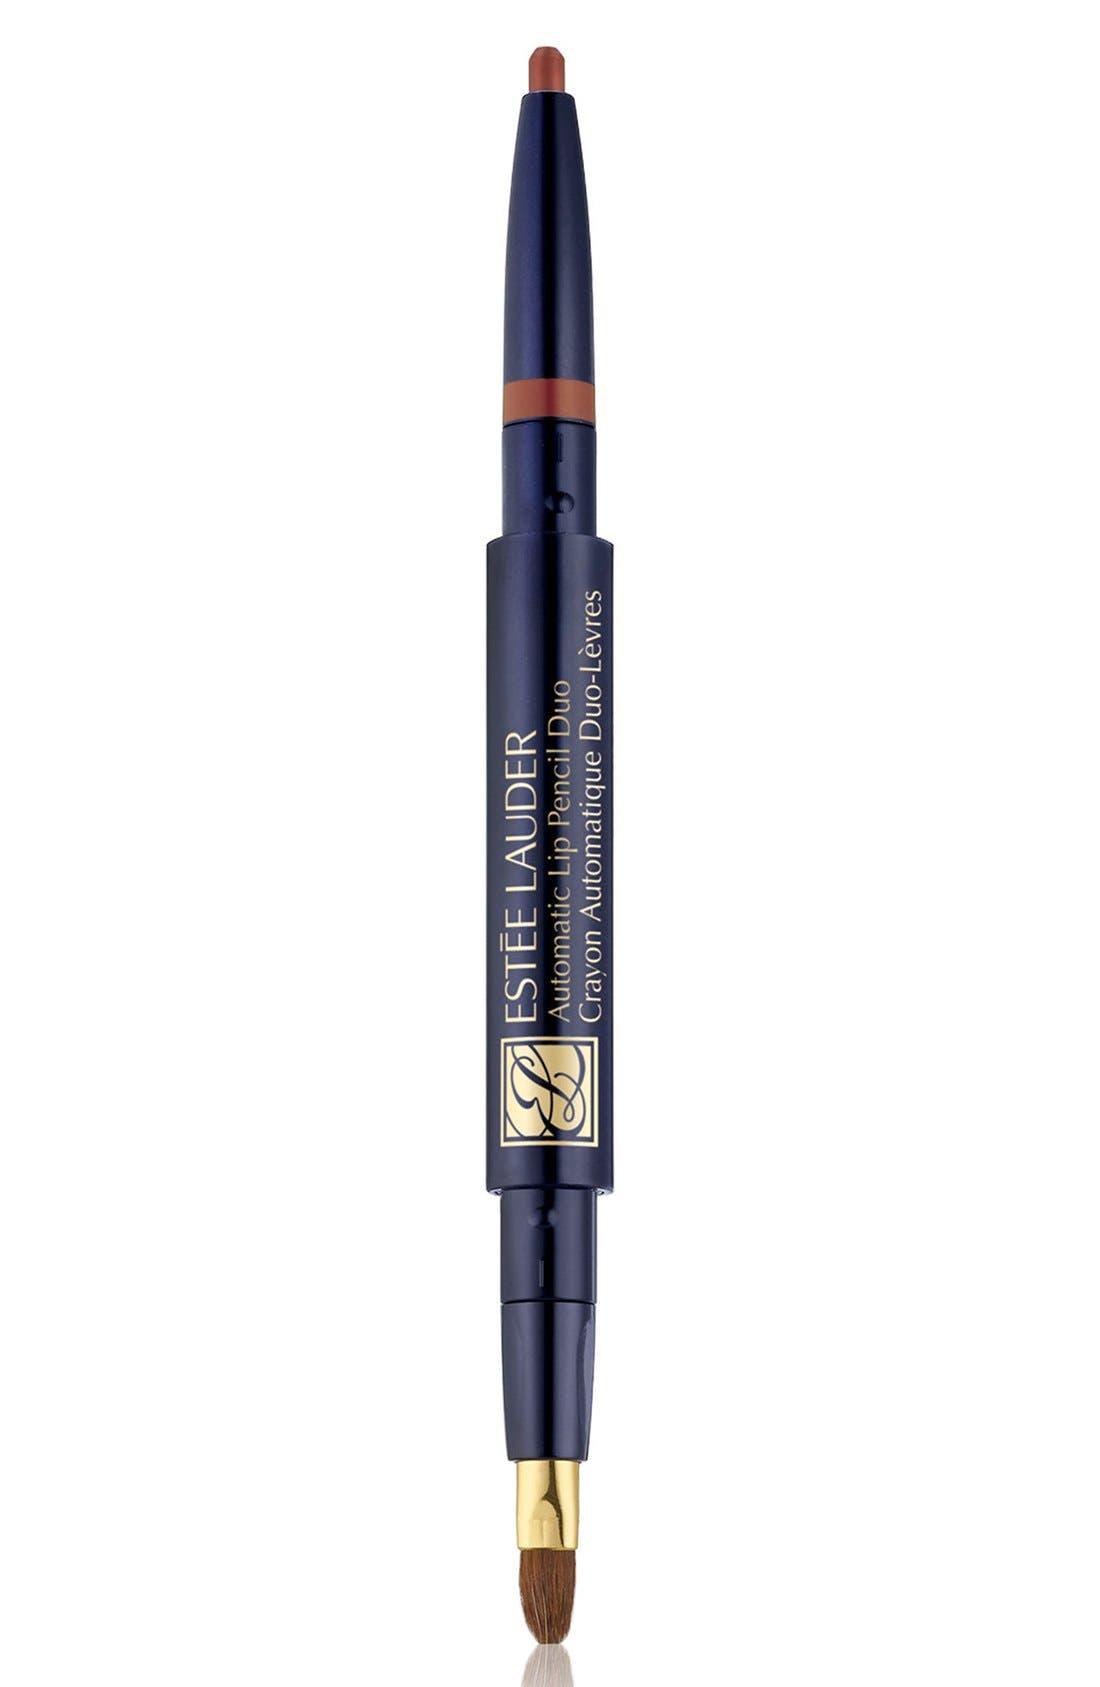 Estee Lauder Automatic Lip Pencil Duo - Spice